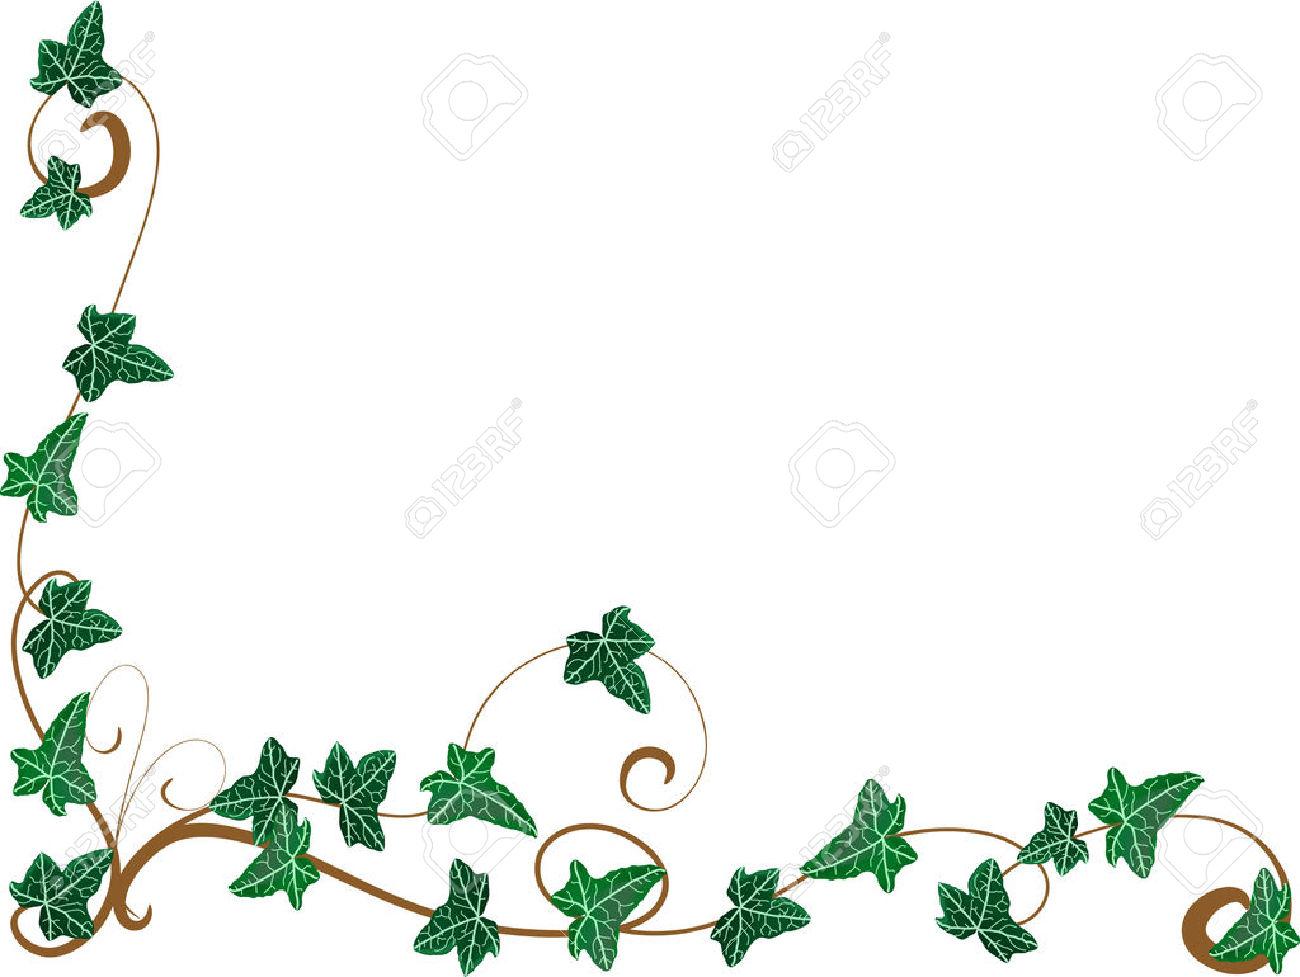 1300x977 Free Ivy Vine Clipart